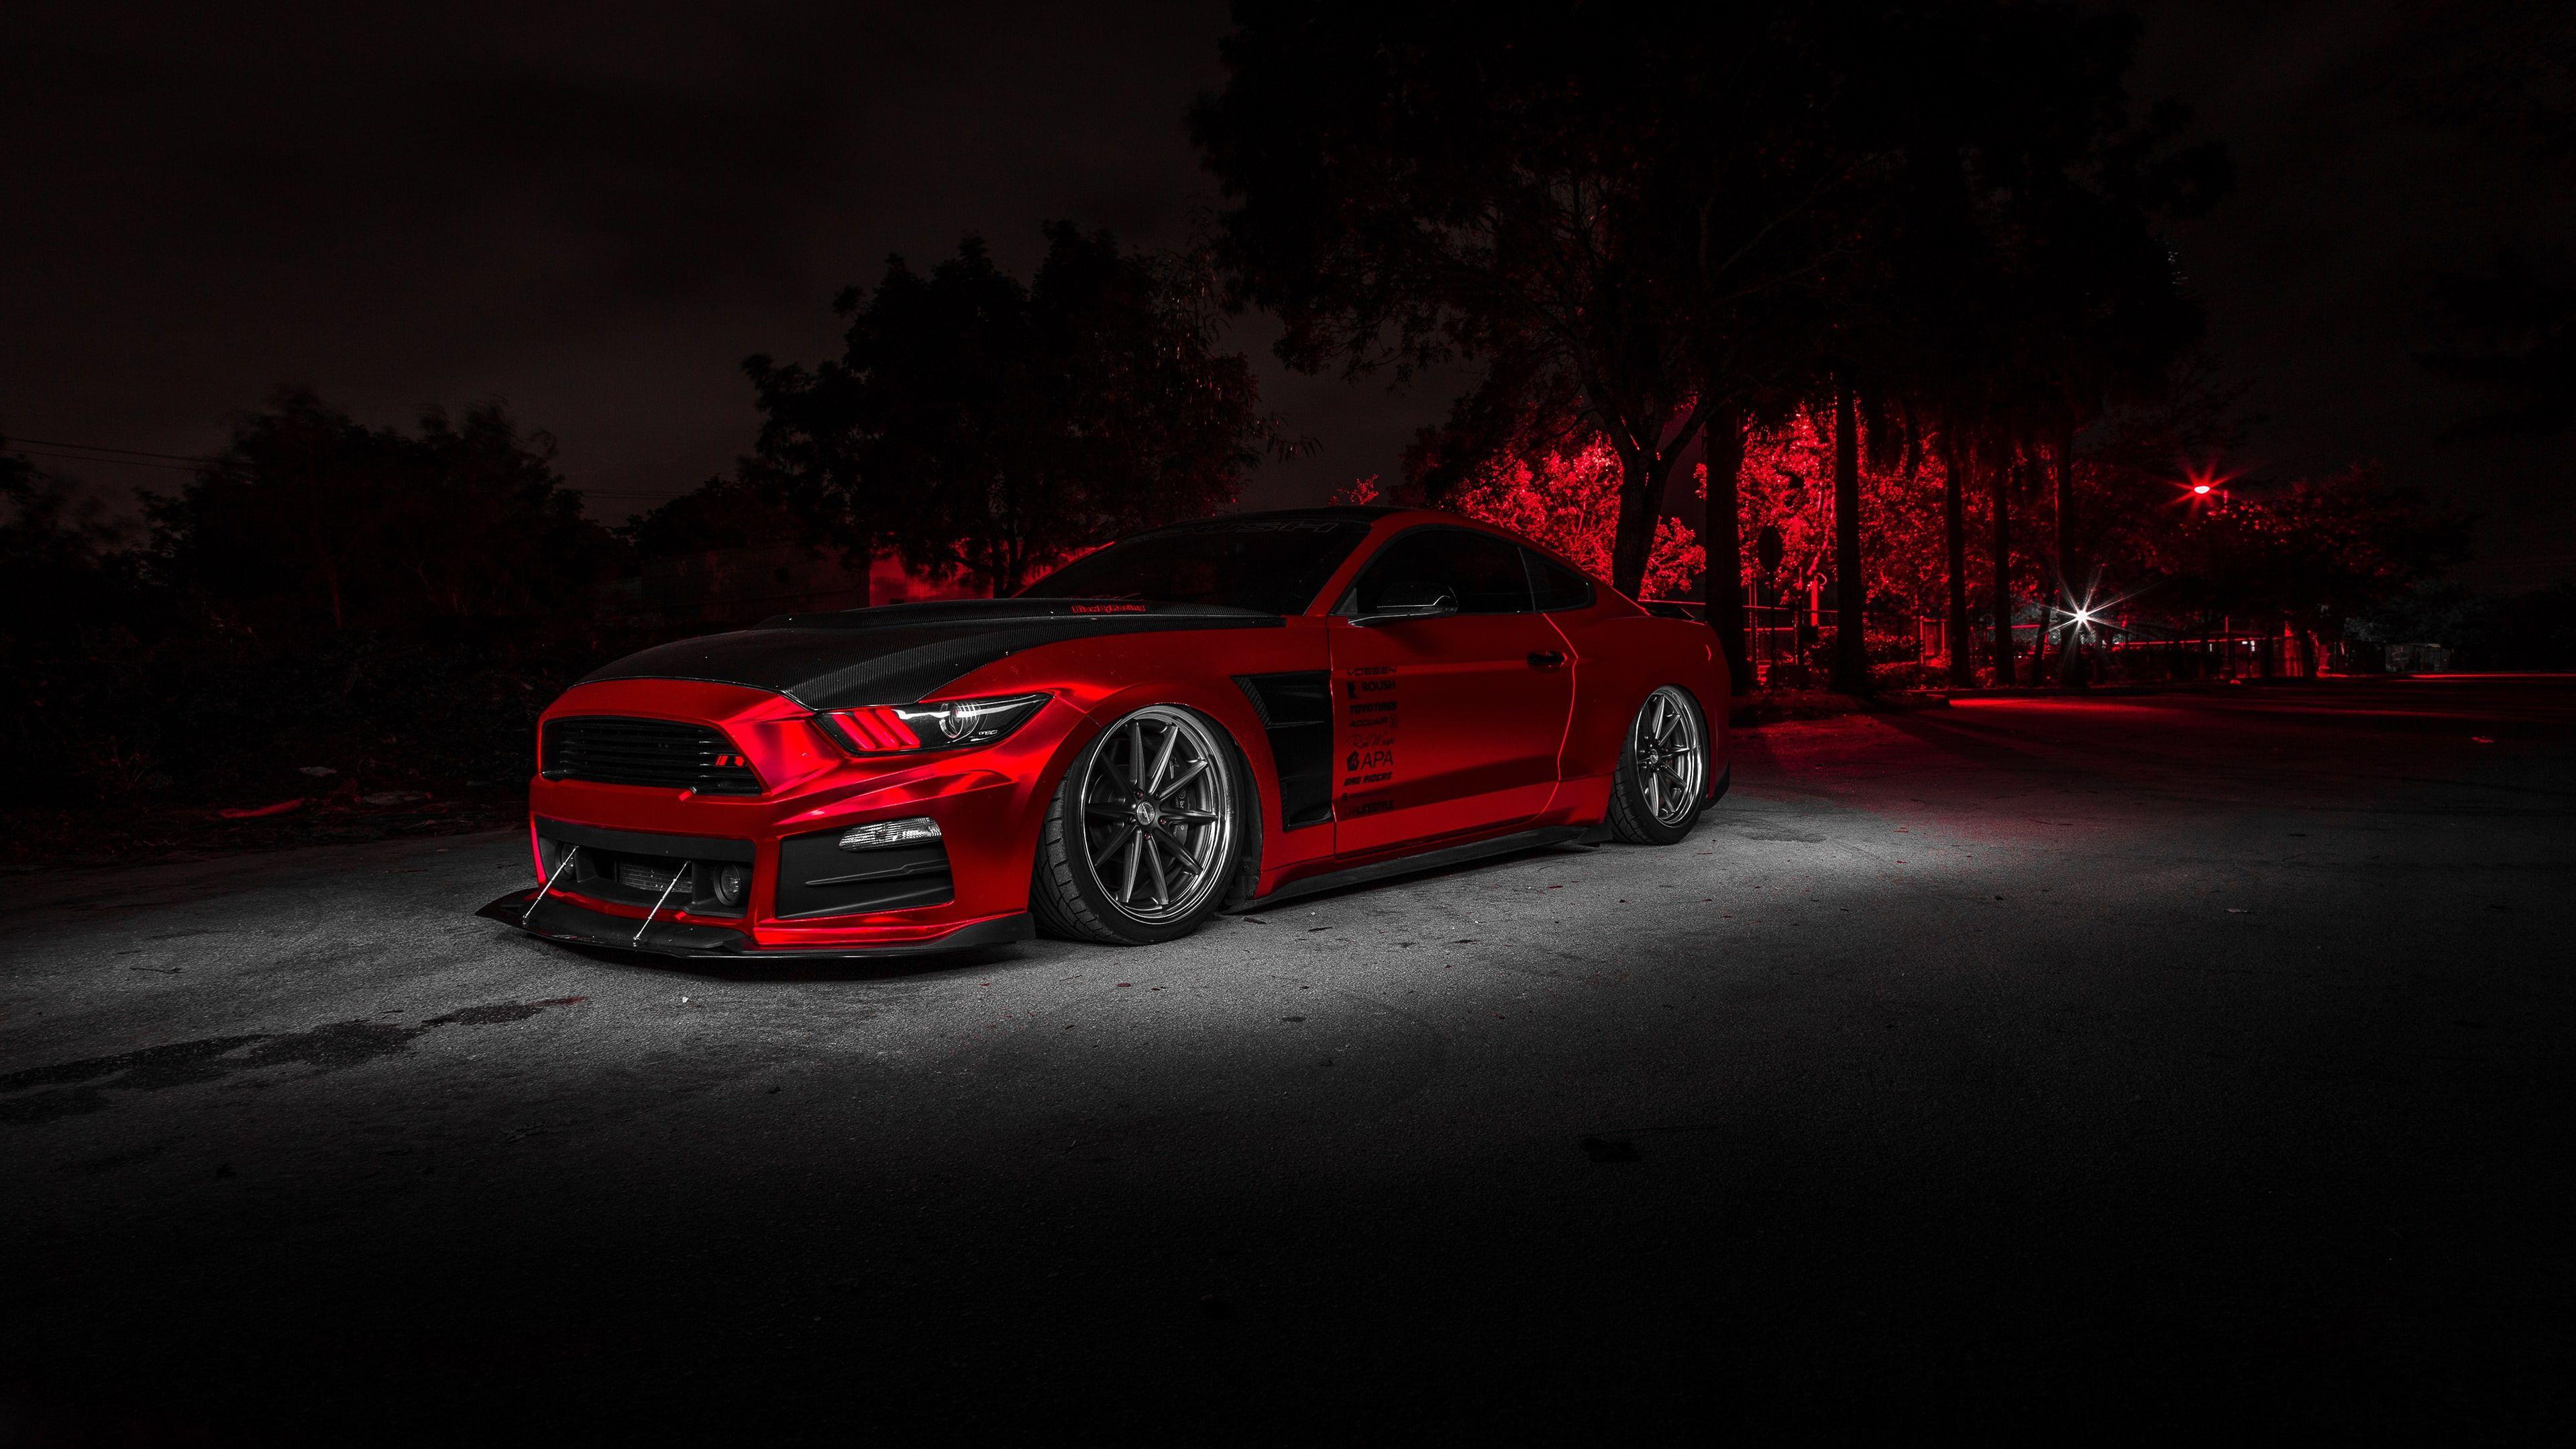 Wallpaper Red Car Design Ford Mustang Automotive Design Vehicle Sports Car Sports Car Wallpaper Car Wallpapers Black Car Wallpaper